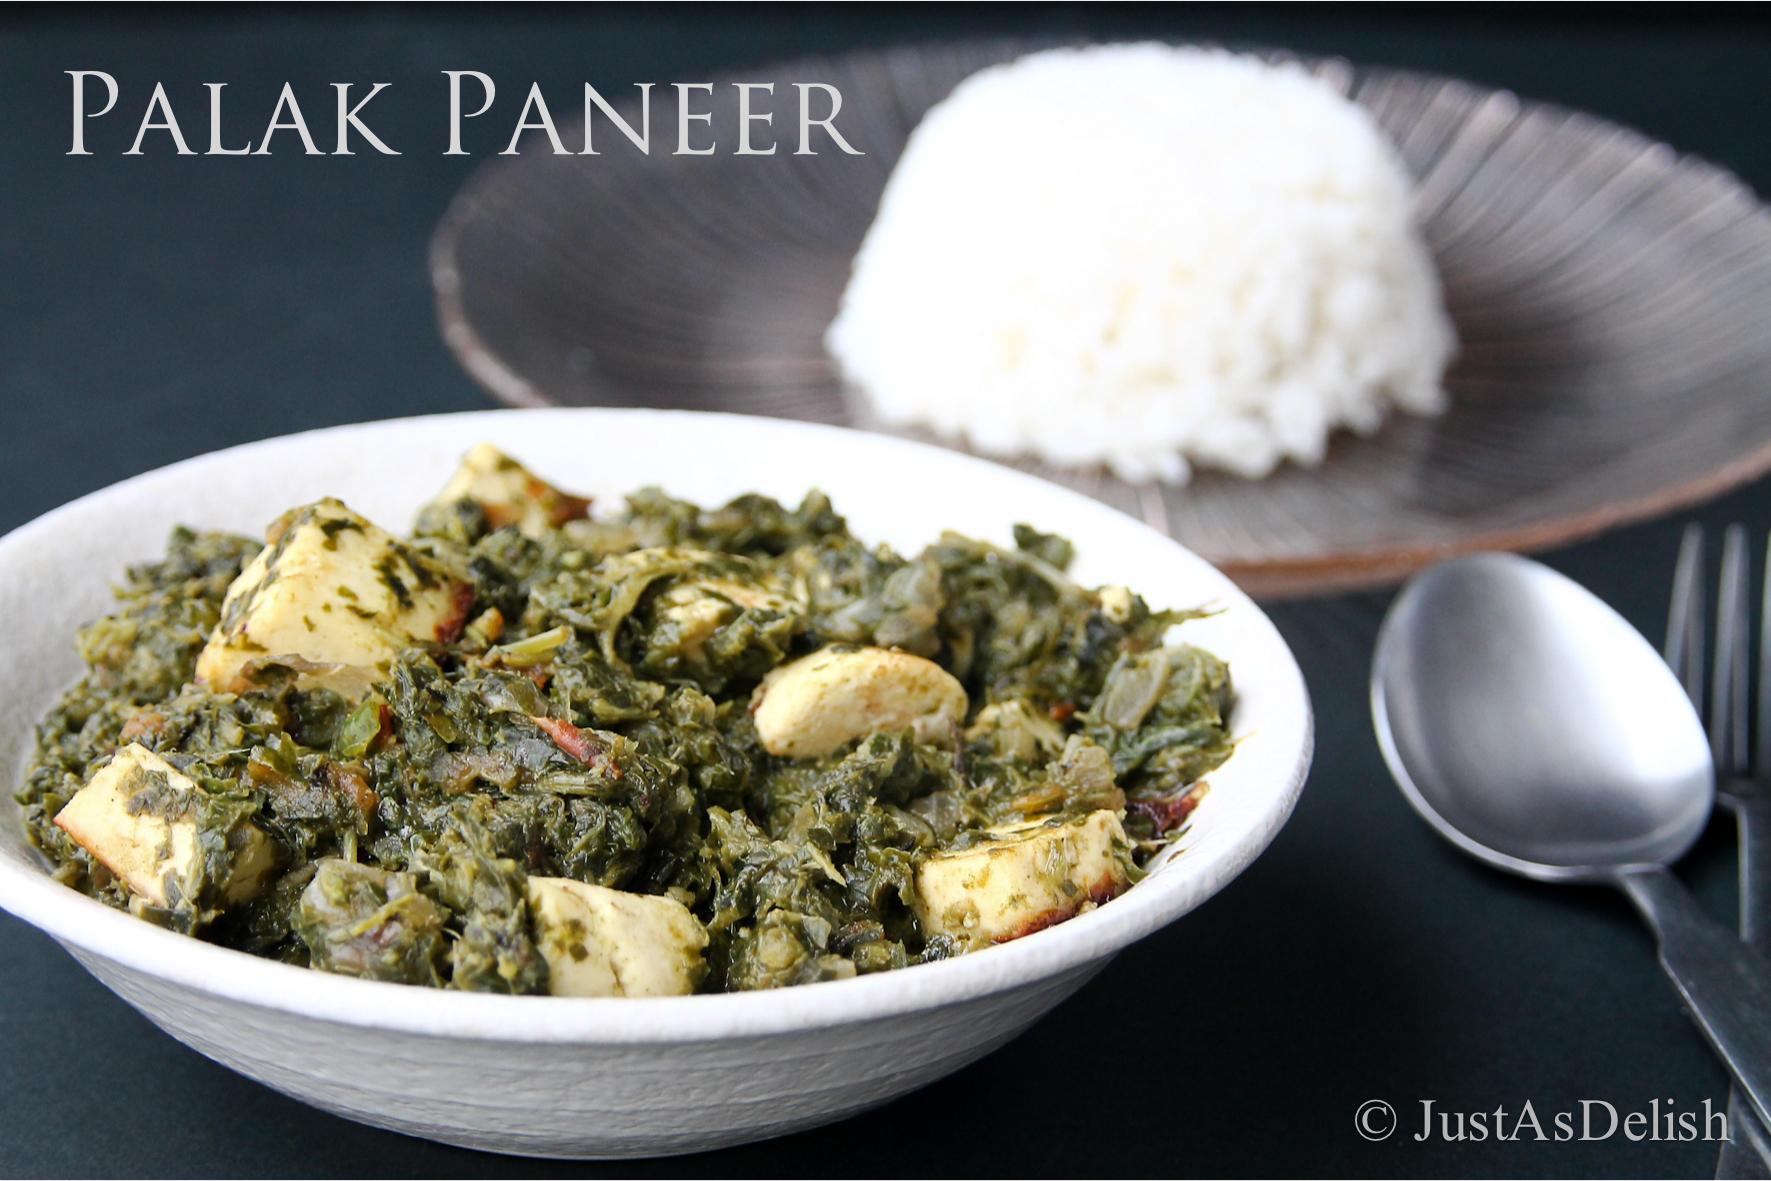 Palak paneer spinach paneer with homemade paneer justasdelish it forumfinder Image collections